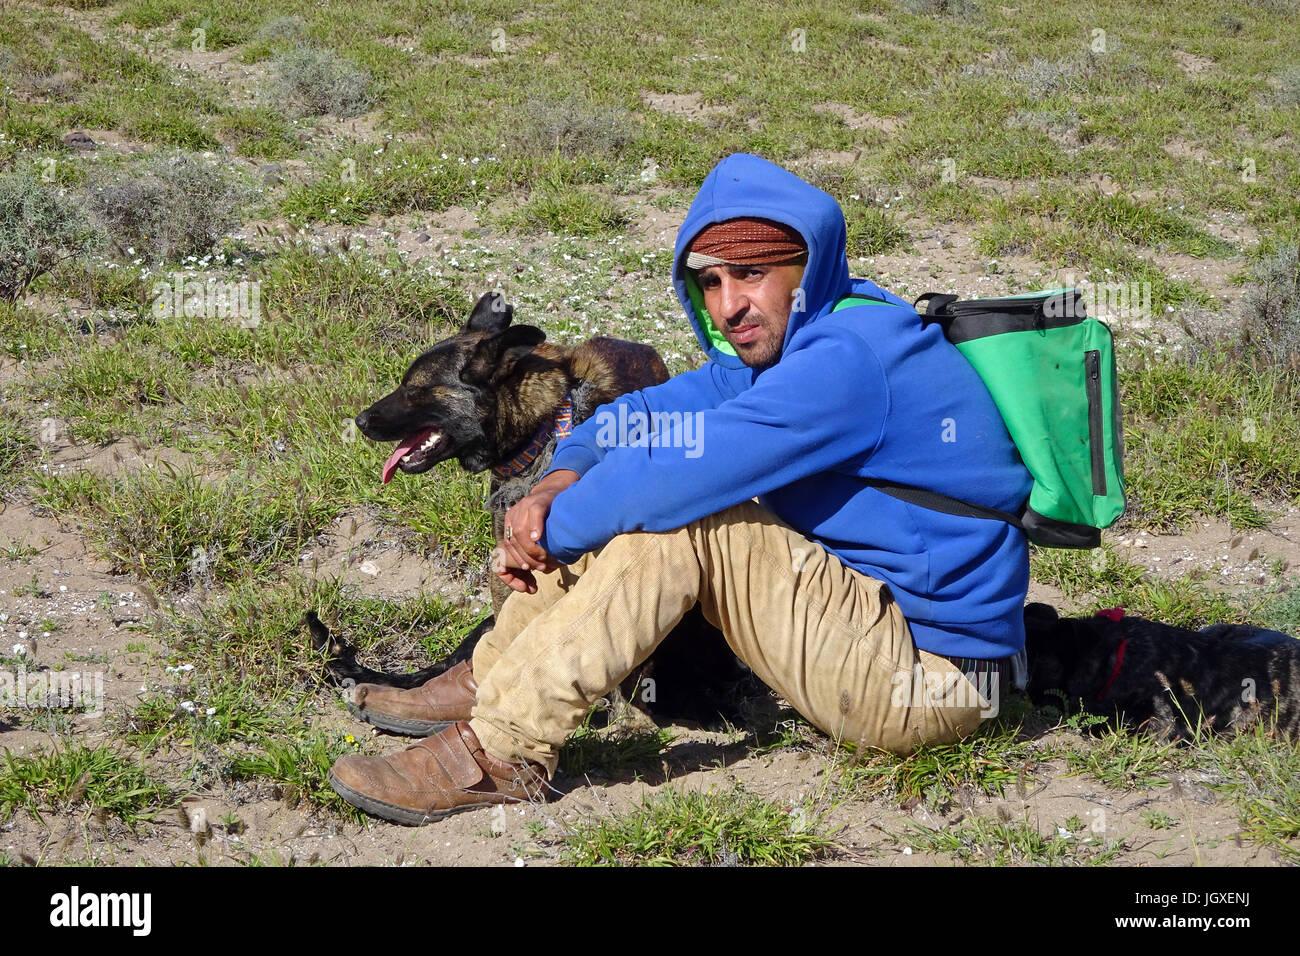 Mit ziegenhirte hirtenhunden wacht ueber sena ziegenherde, caleta de Famara, Lanzarote, KANARISCHE INSELN, Europa | herder de cabra con los perros pastores Foto de stock